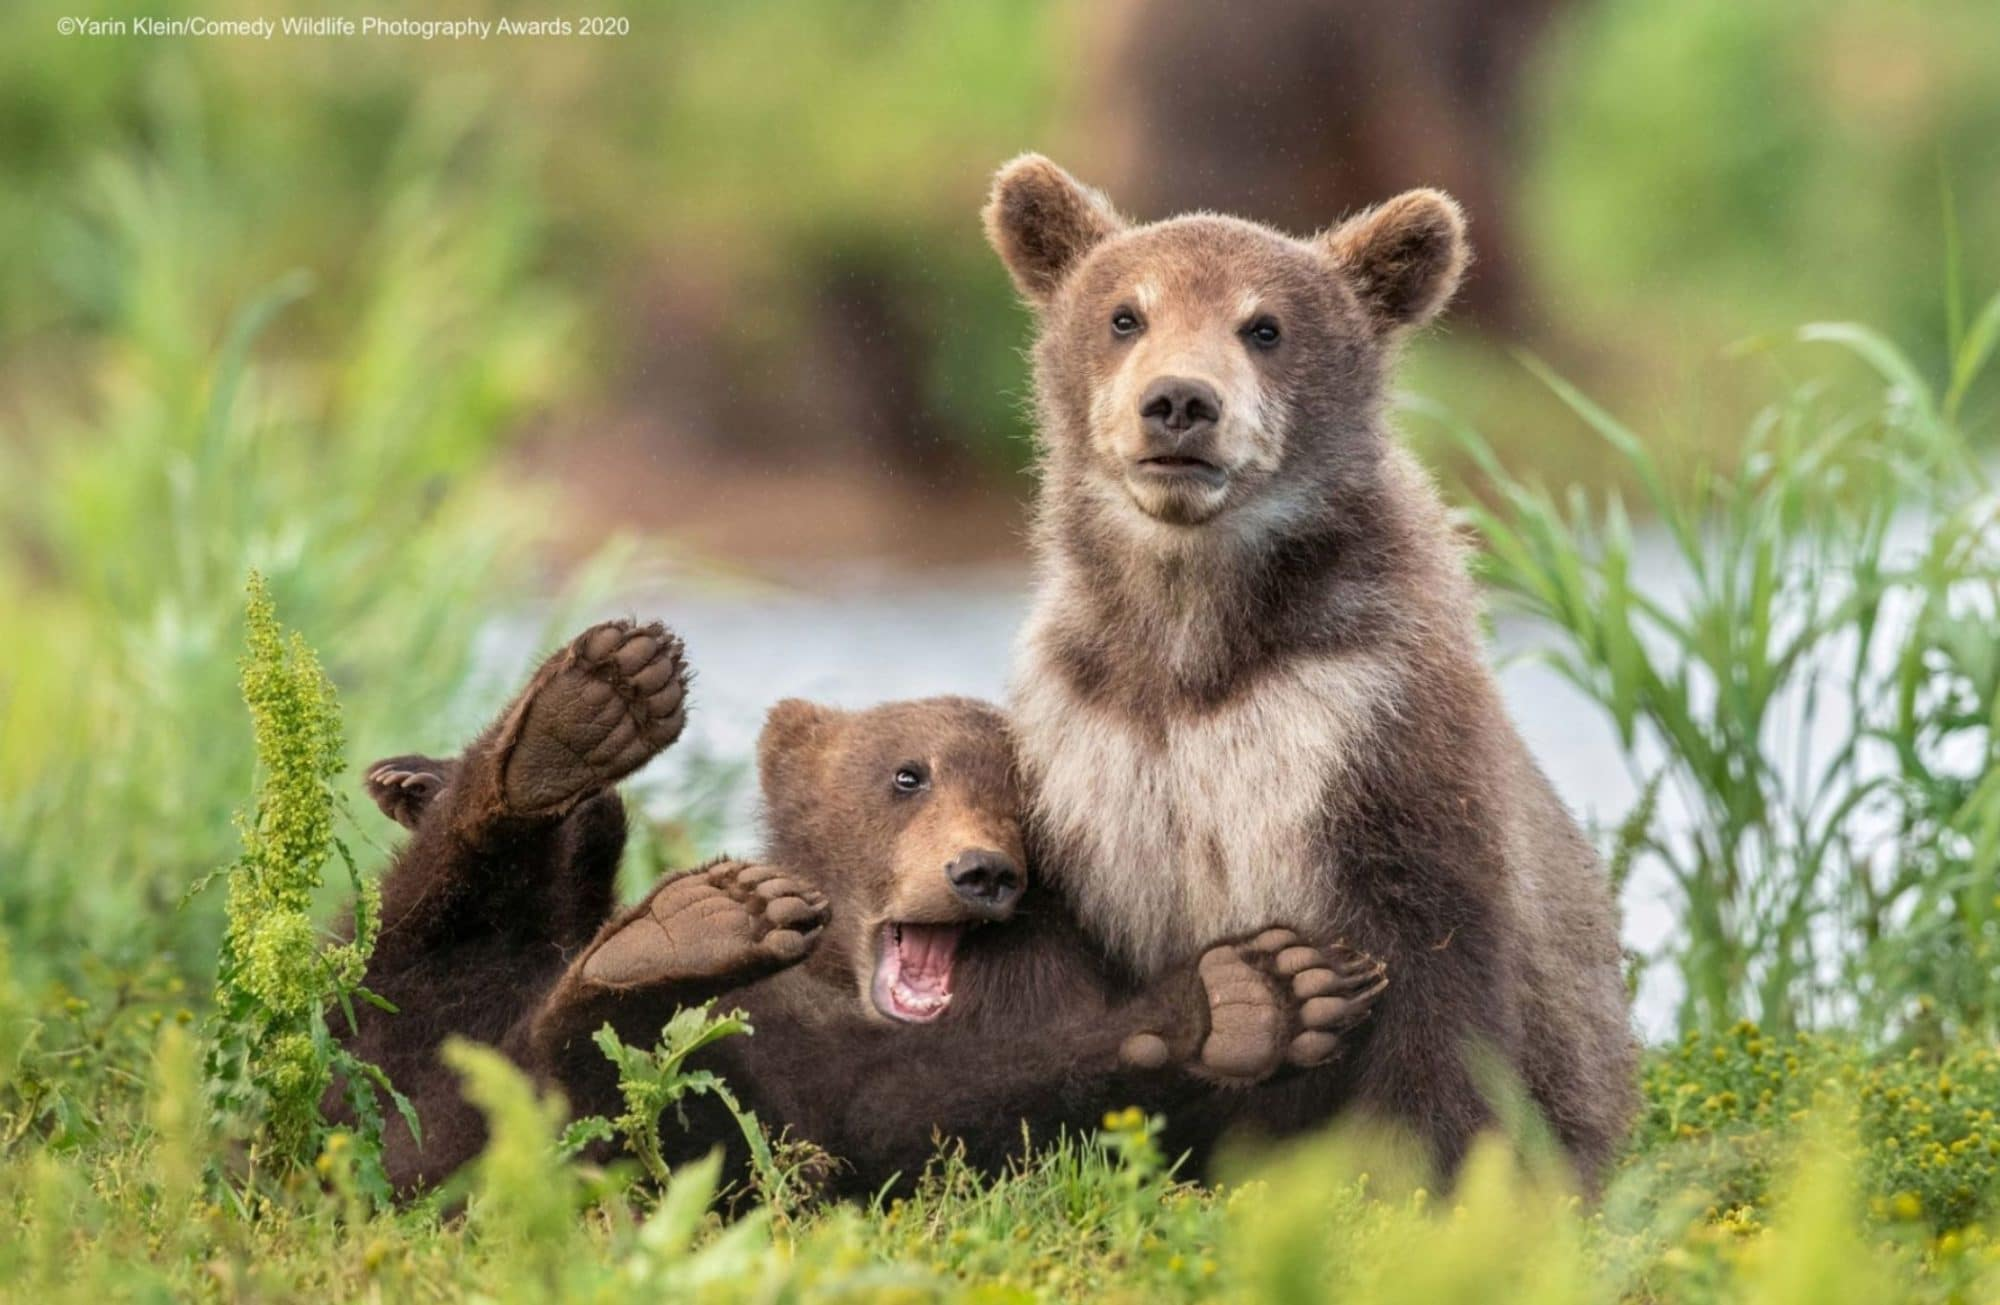 Comedy Wildlife Photography Awards 2020 : Les 15 photos d'animaux les plus fun !